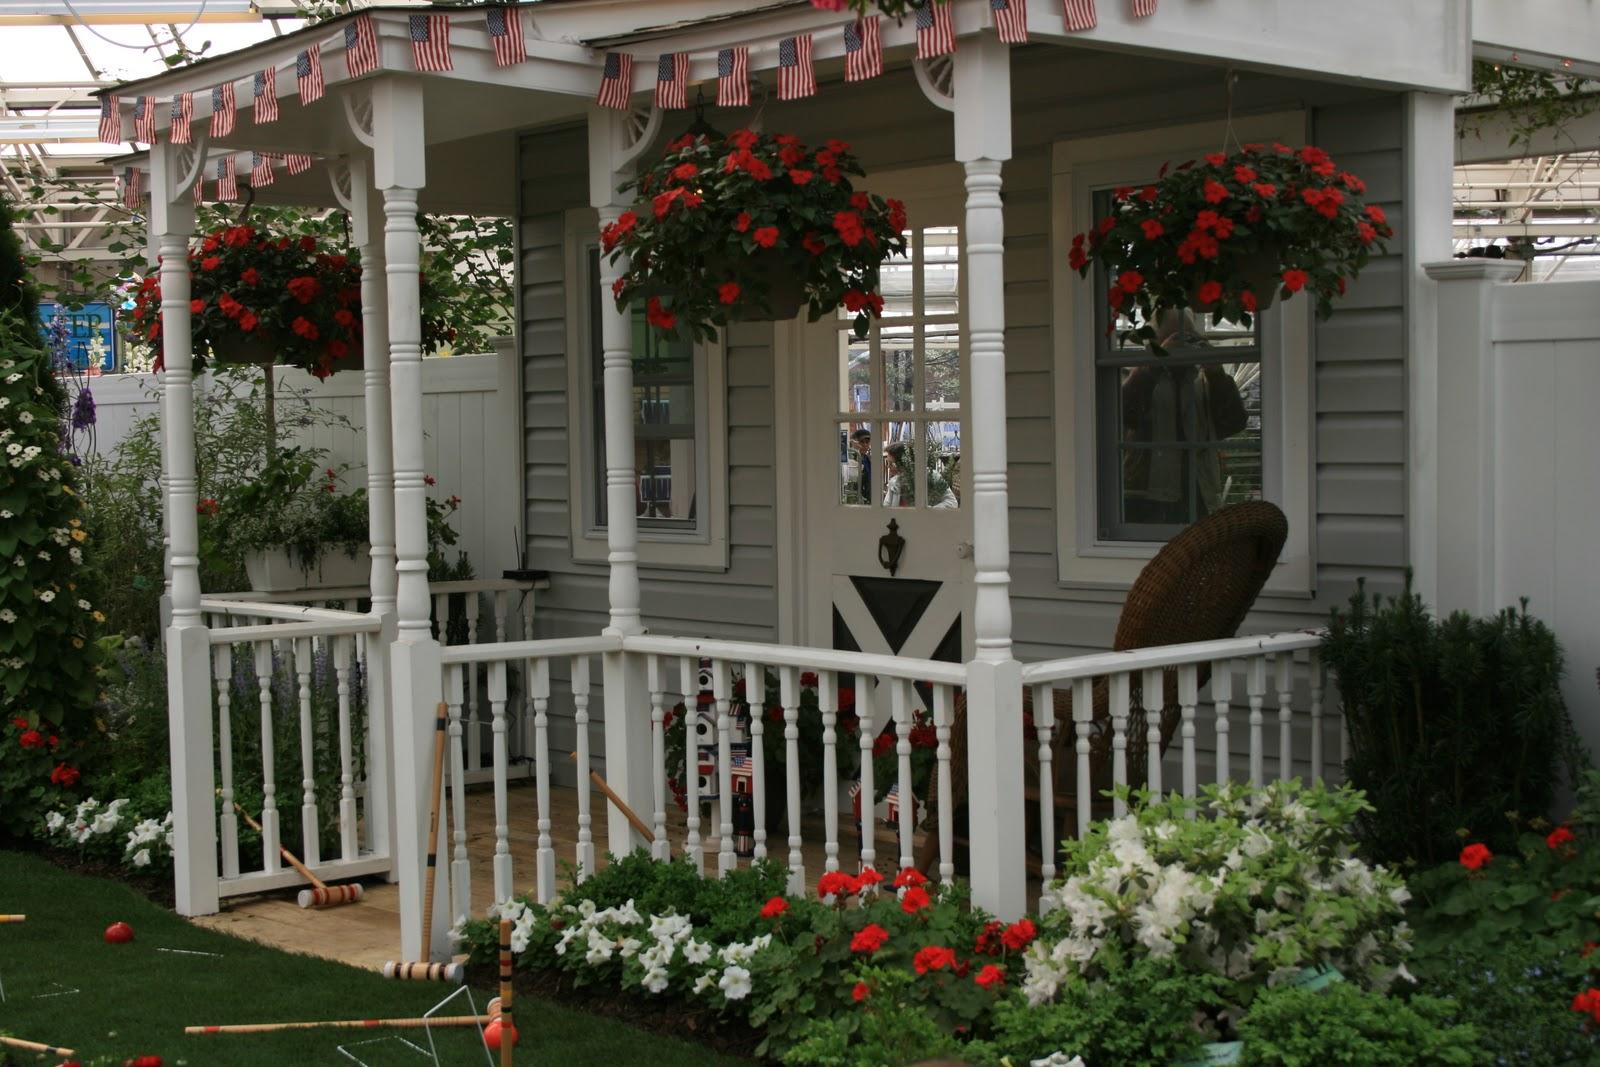 Careless gardener great landscape ideas the hicks garden for Front porch garden designs